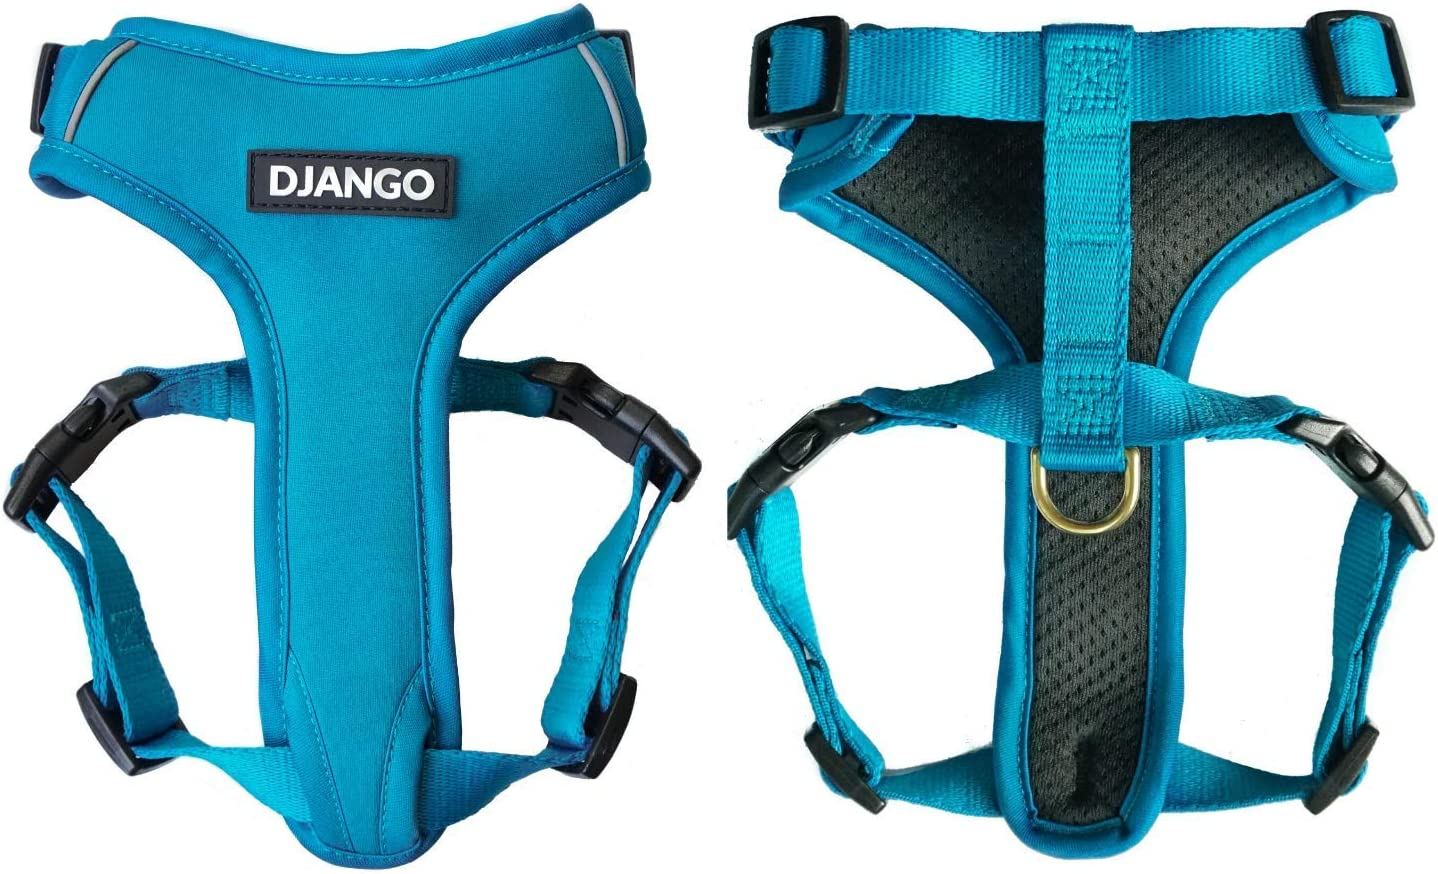 Dedication DJANGO Adventure Dog Harness – Max 71% OFF Comfortable and Durable Re